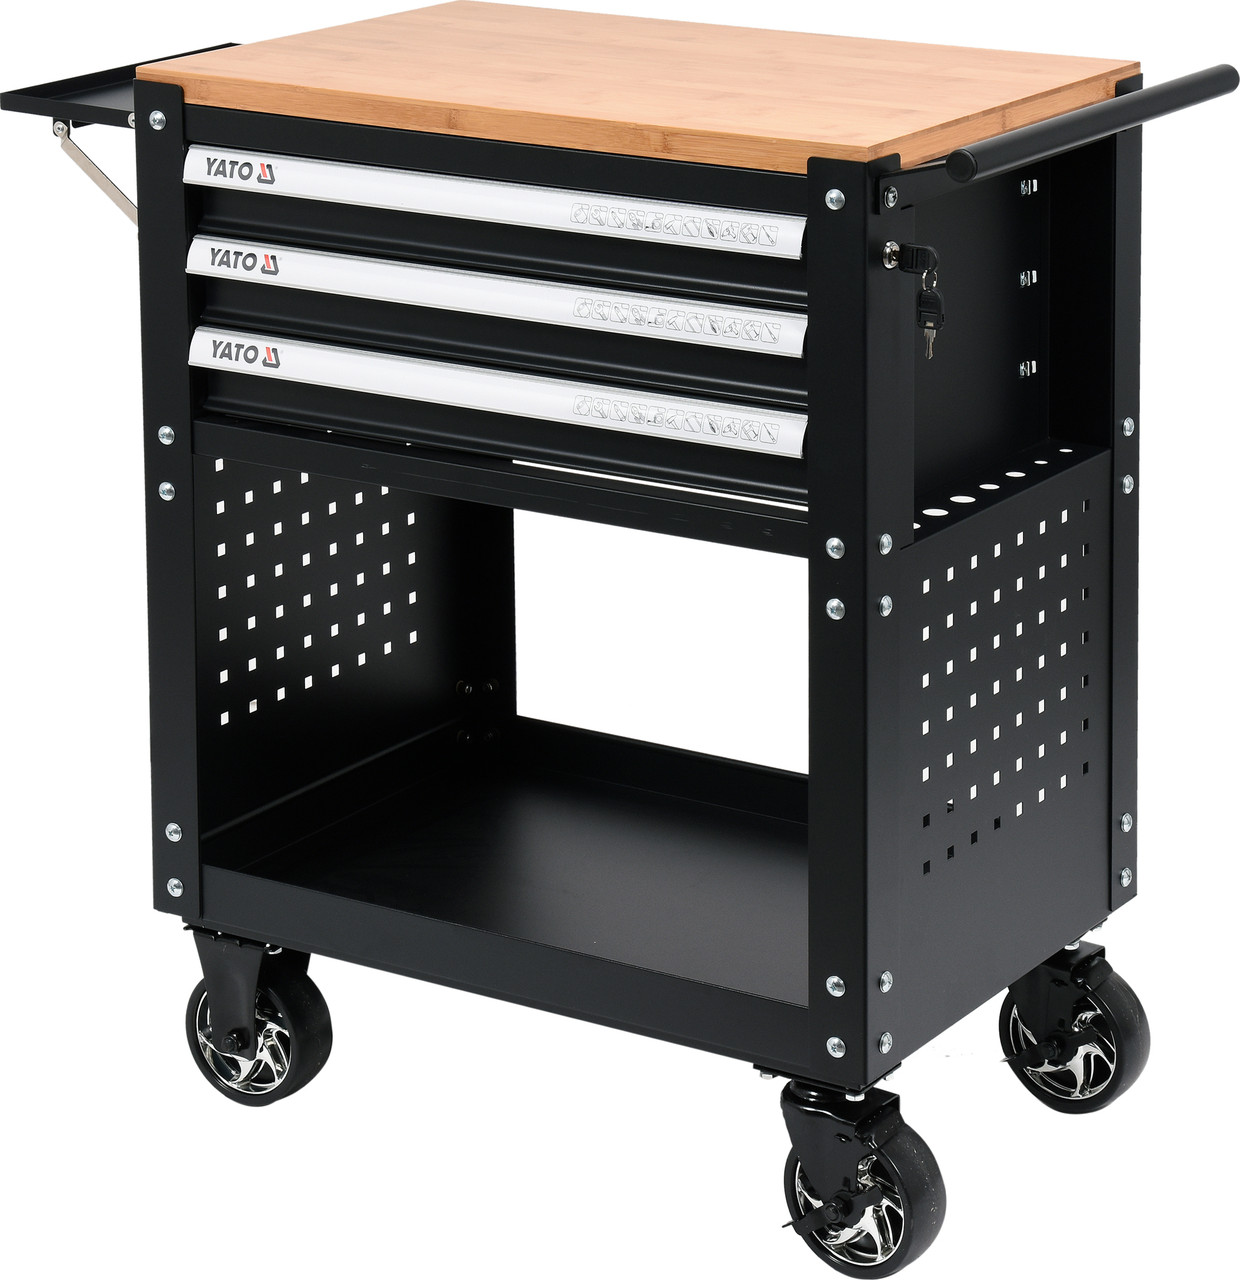 Шкаф с инструментами на 4 колесах YATO 90.5 х 68 х 45.5 см с 3 ящиками 162 шт